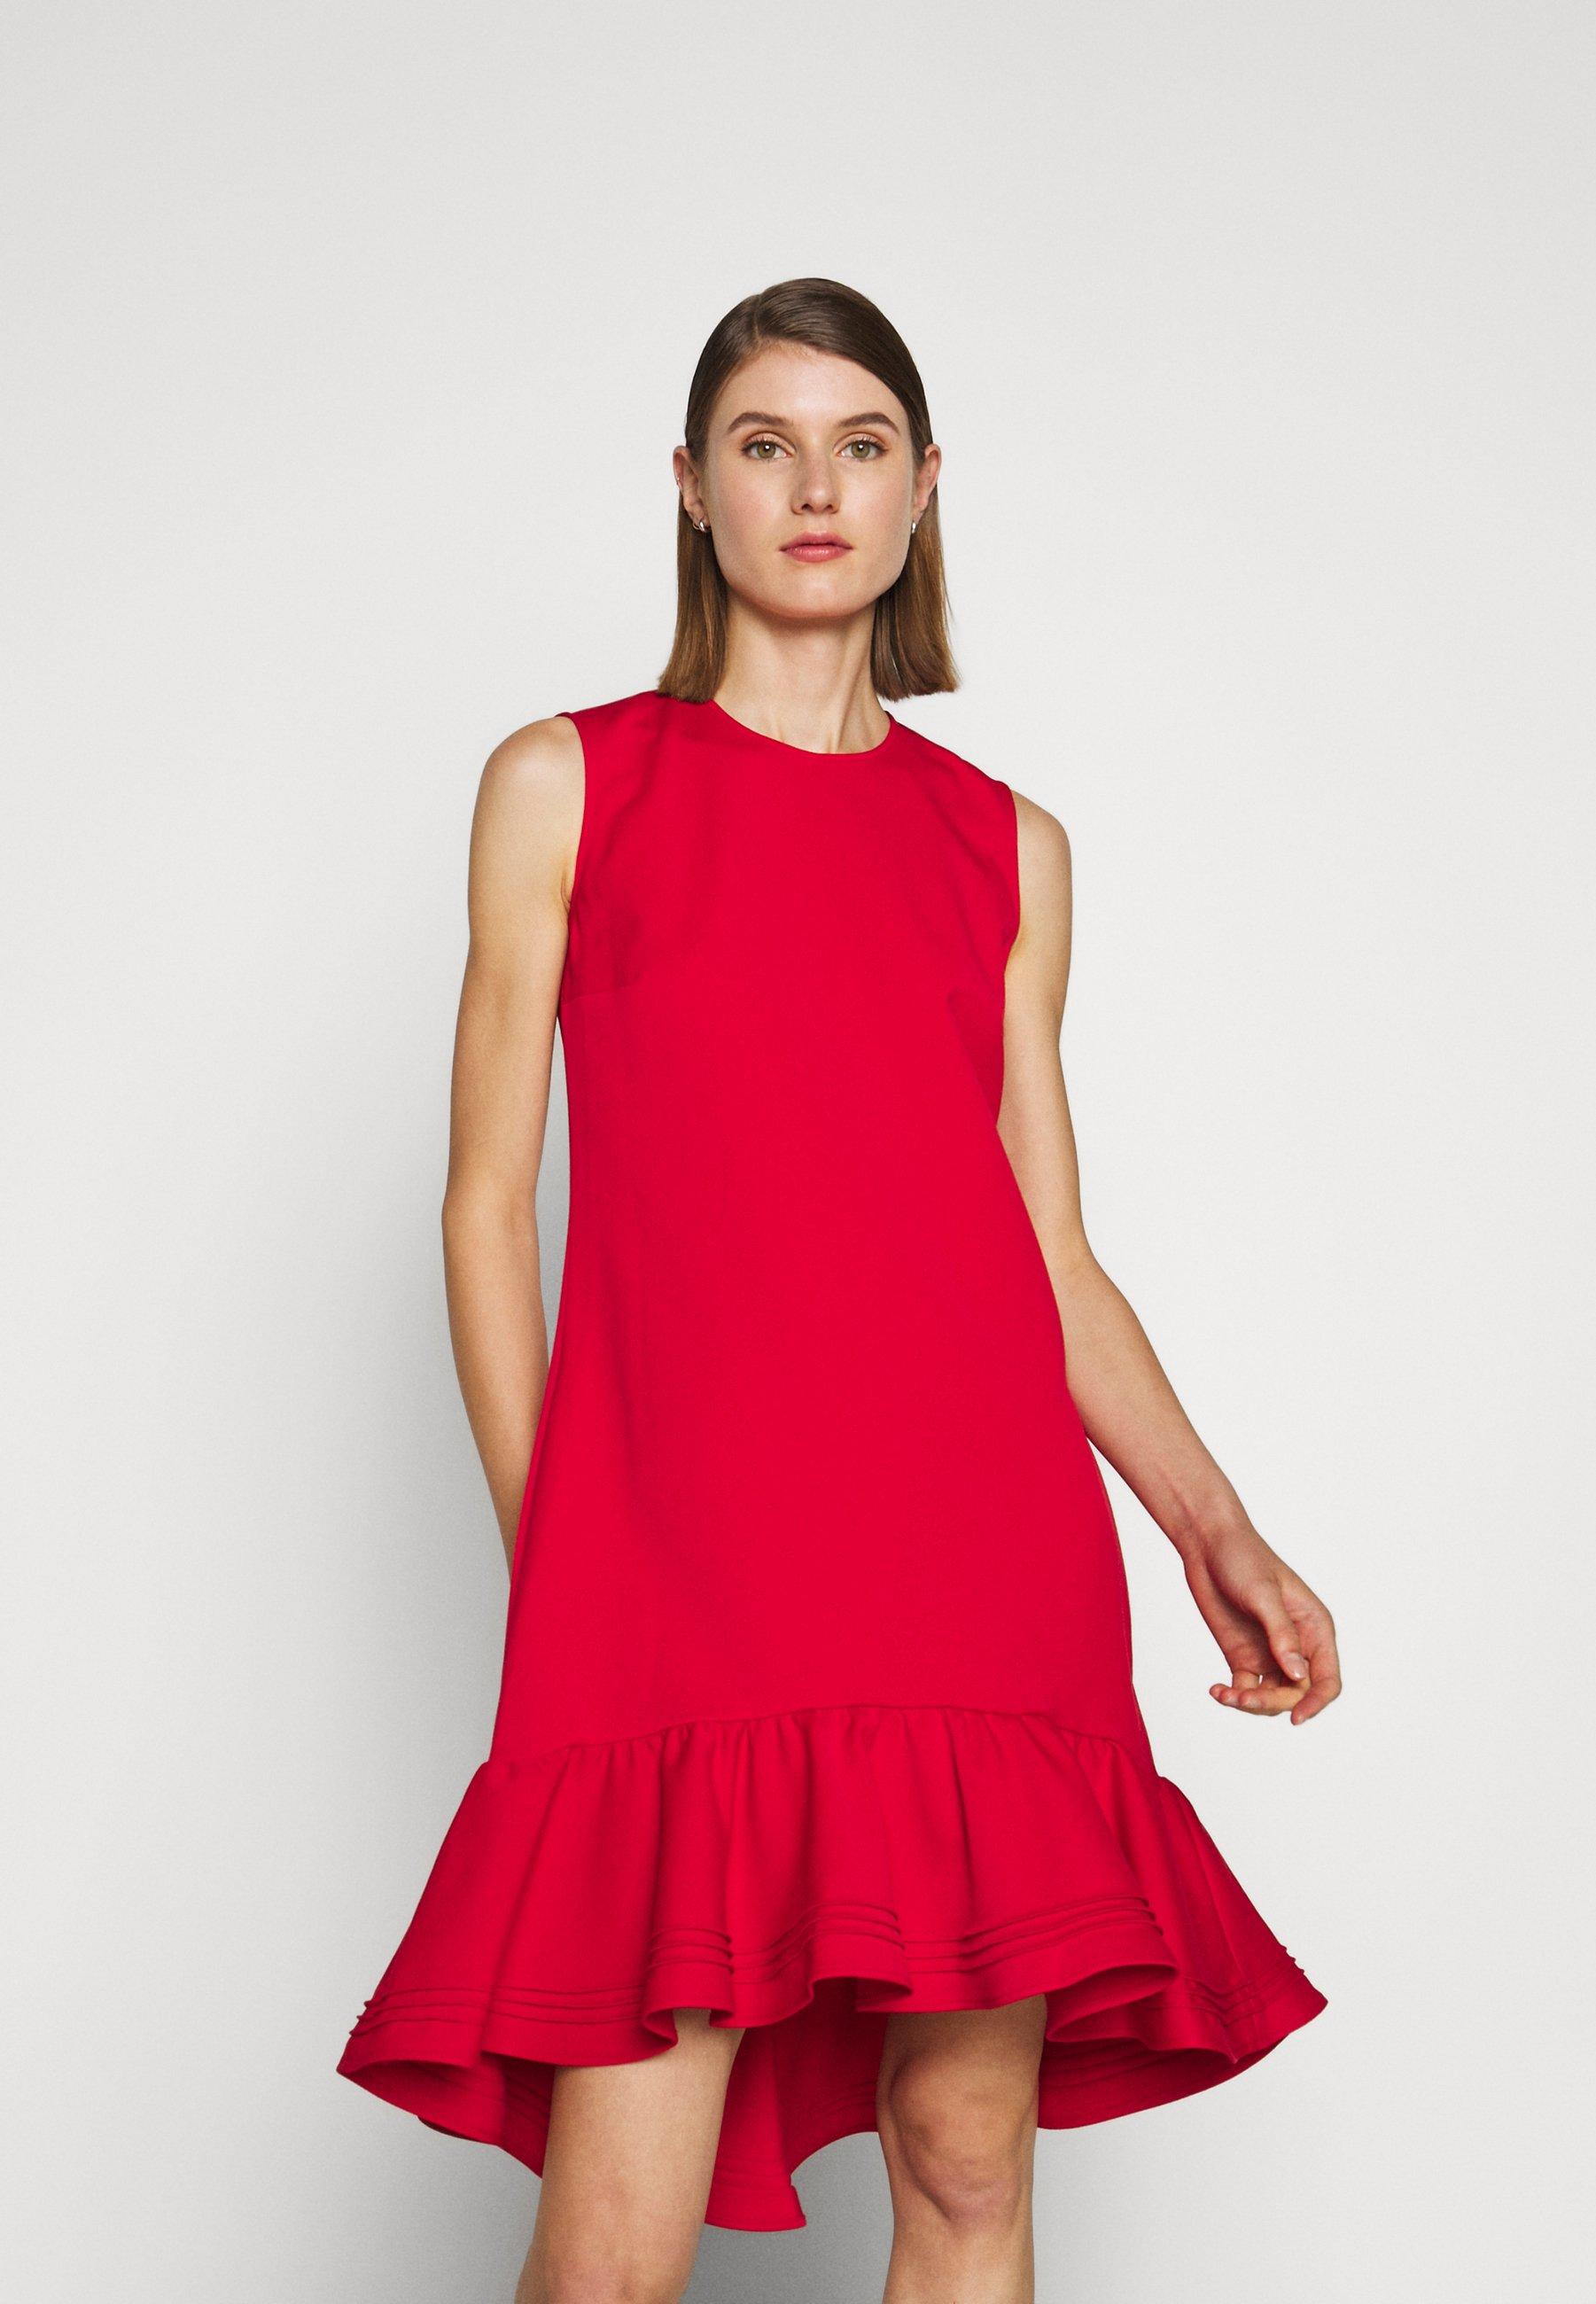 Mejor Proveedor Ropa de mujer Victoria Victoria Beckham PINTUCK FLOUNCE HEM SHIFT DRESS Vestido informal postbox red vV81zr